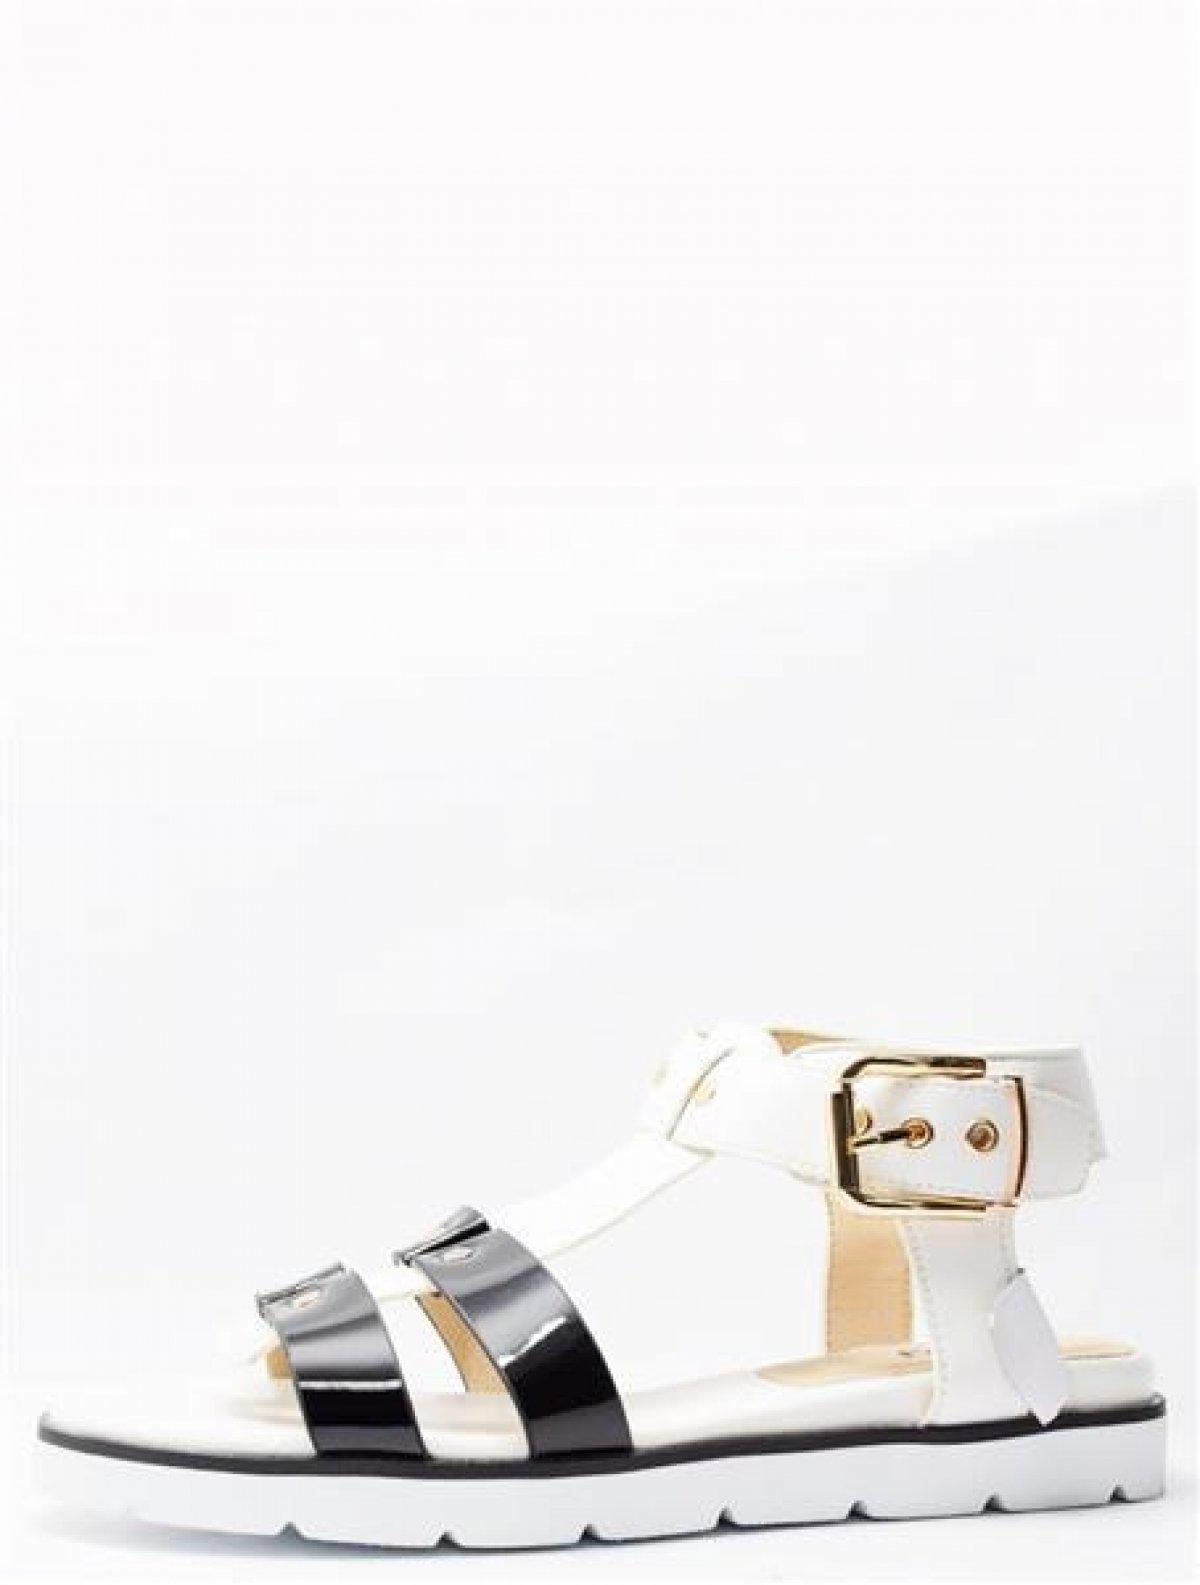 Betsy 977030/01-01 женские сандали